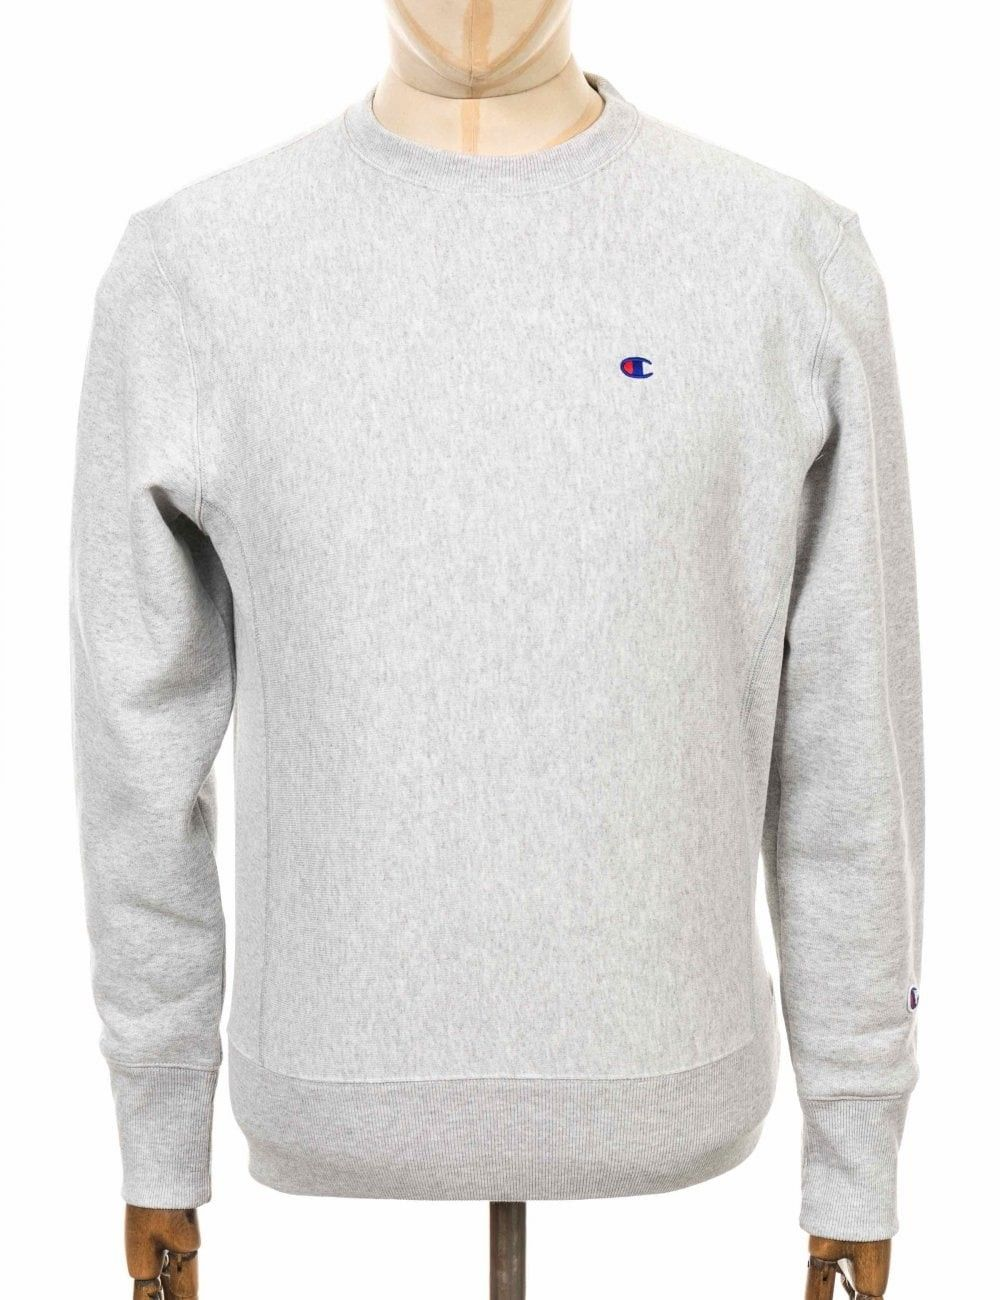 Champion Reverse Weave Crewneck Sweatshirt Loxgm Light Grey Colour Champion Cloth [ 1300 x 1000 Pixel ]